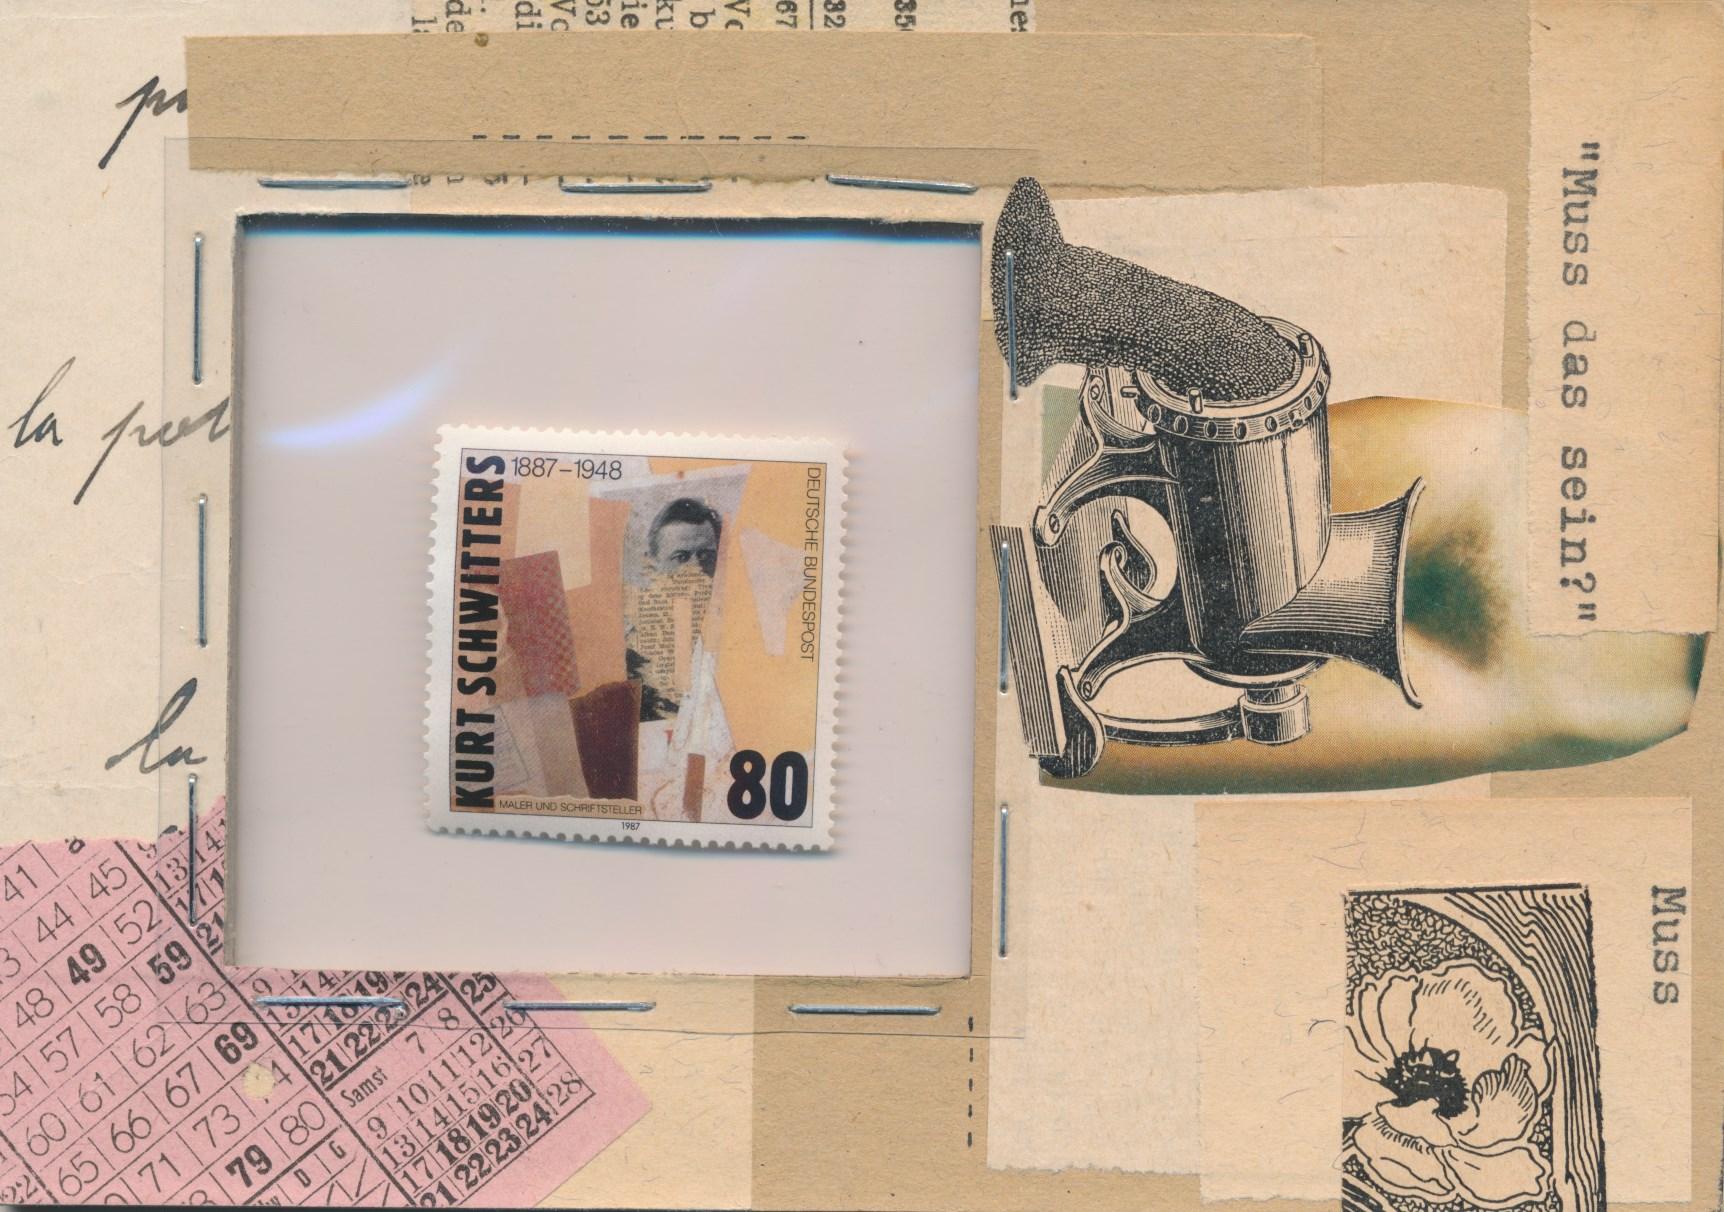 Mail art from Walter Brandtner/AUSTRIA